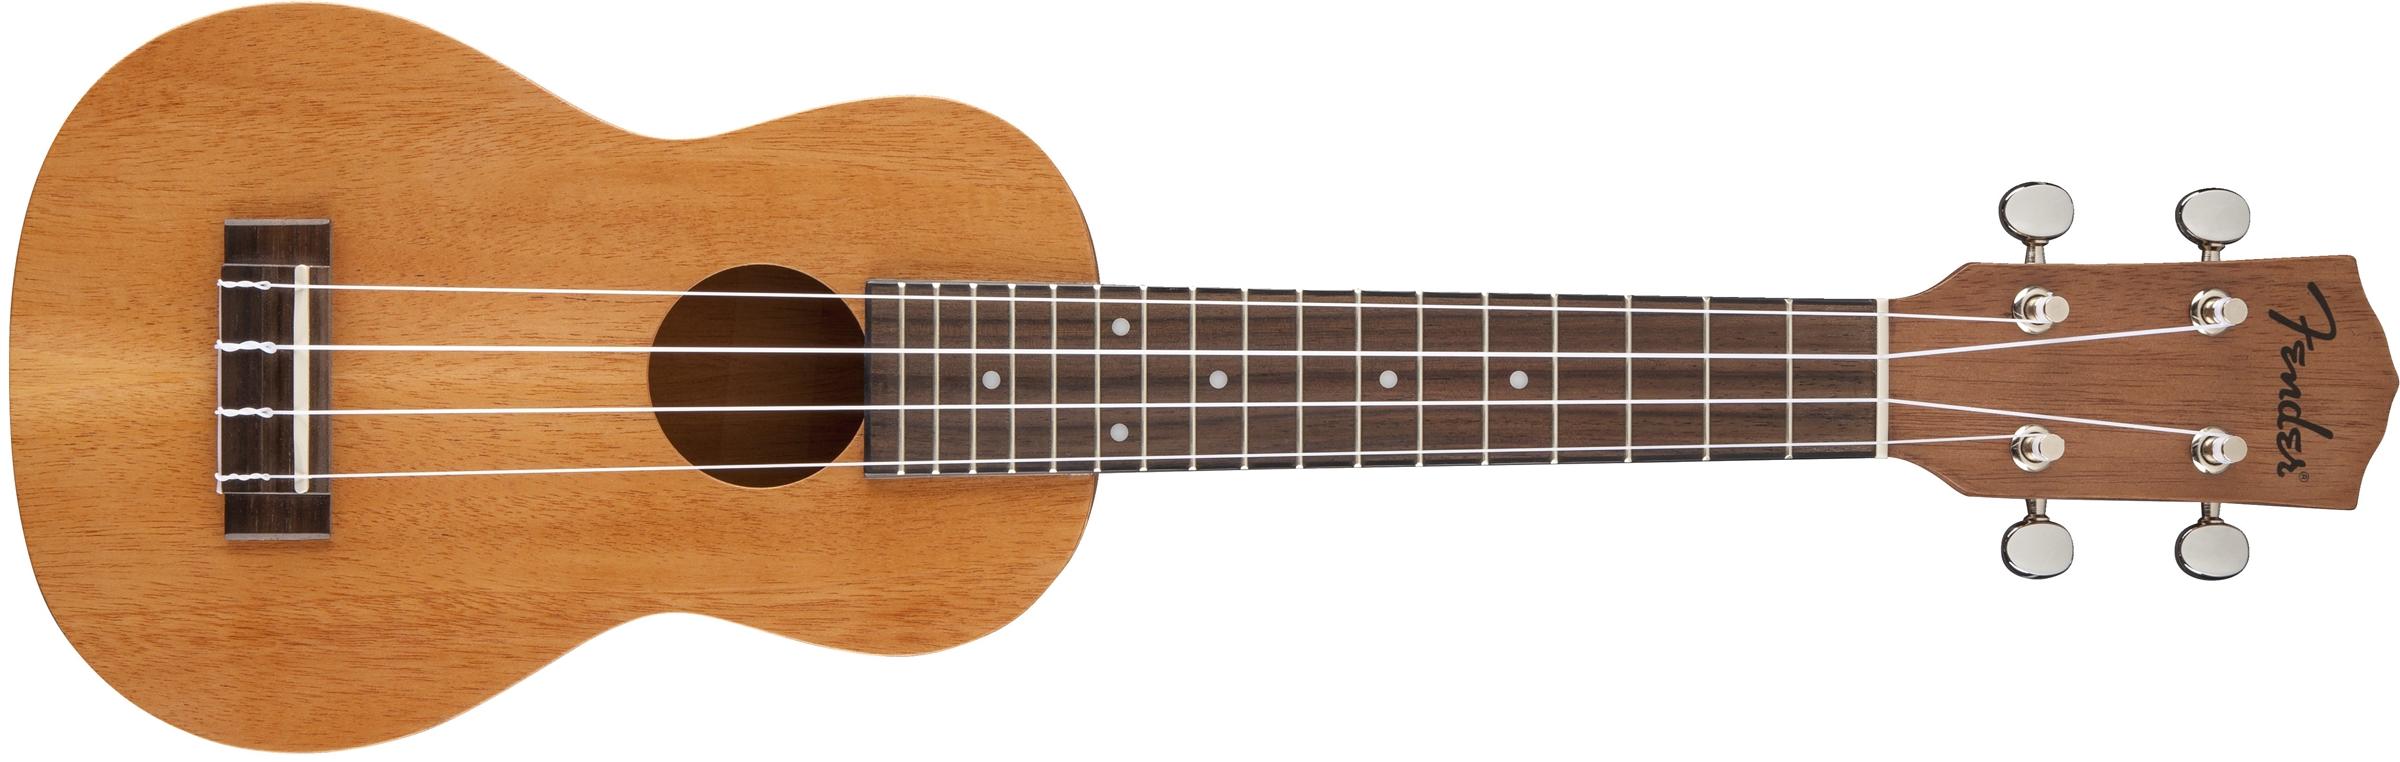 how to play the plage ukulele